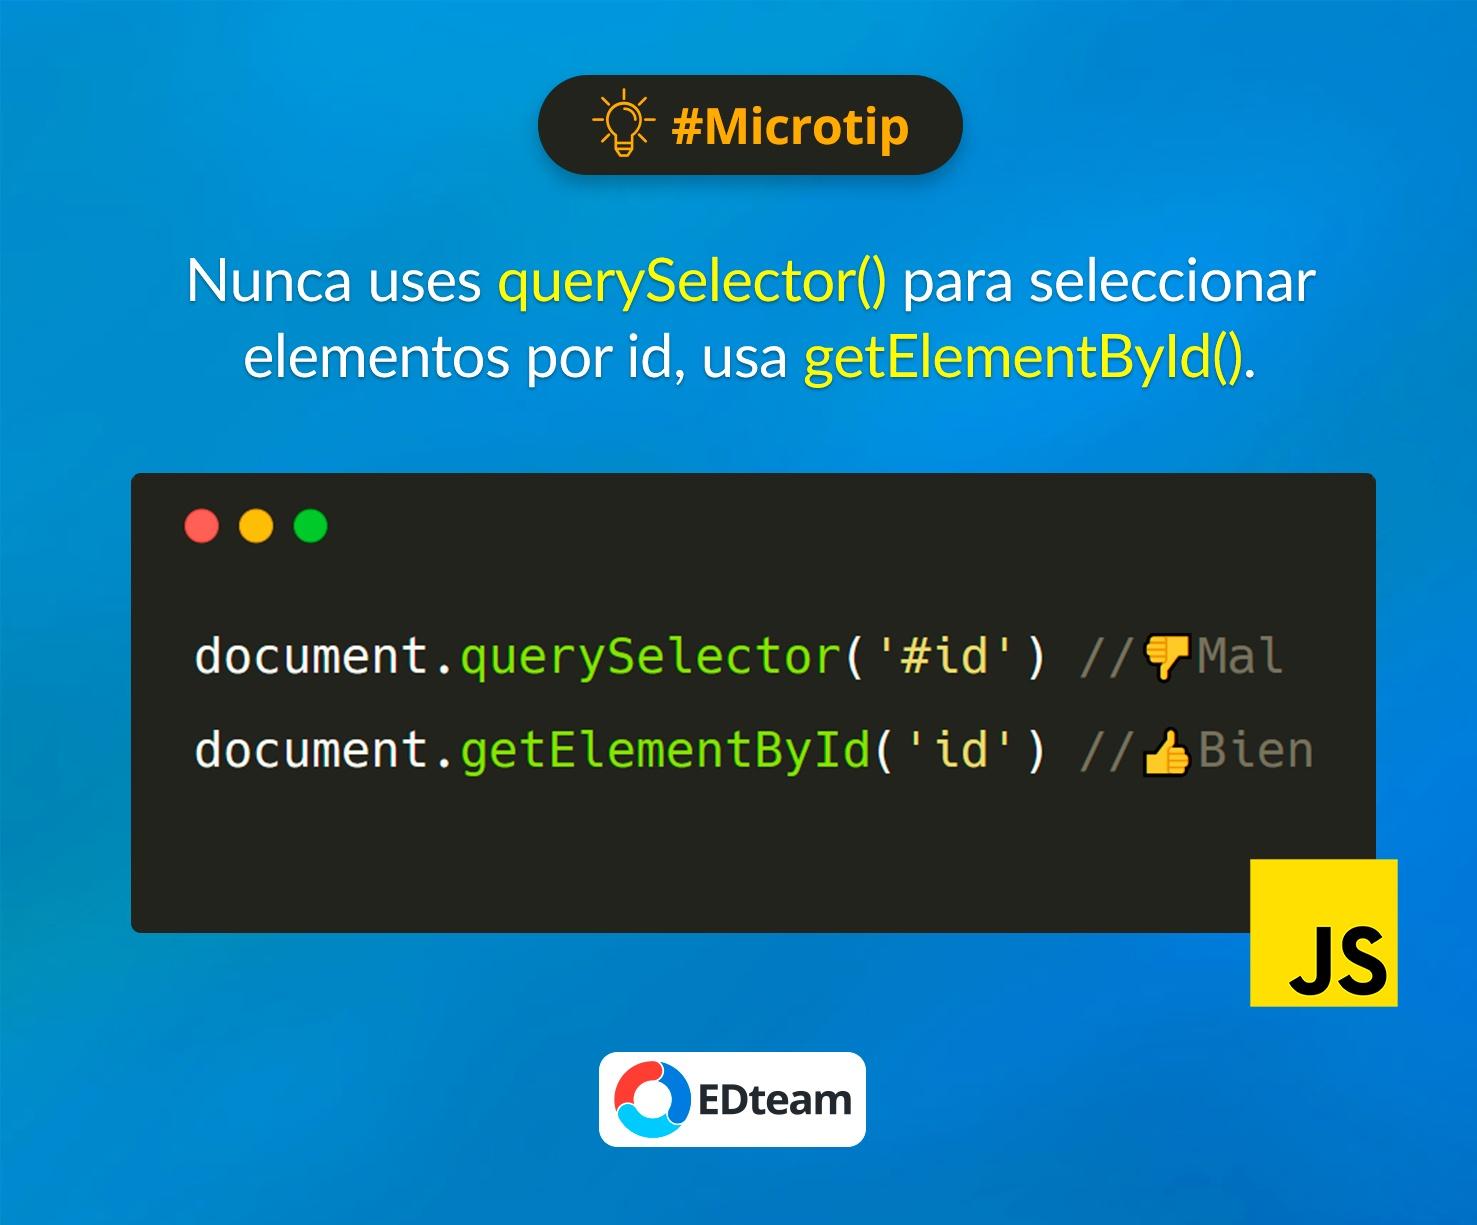 #Microtip: No uses querySelector para id